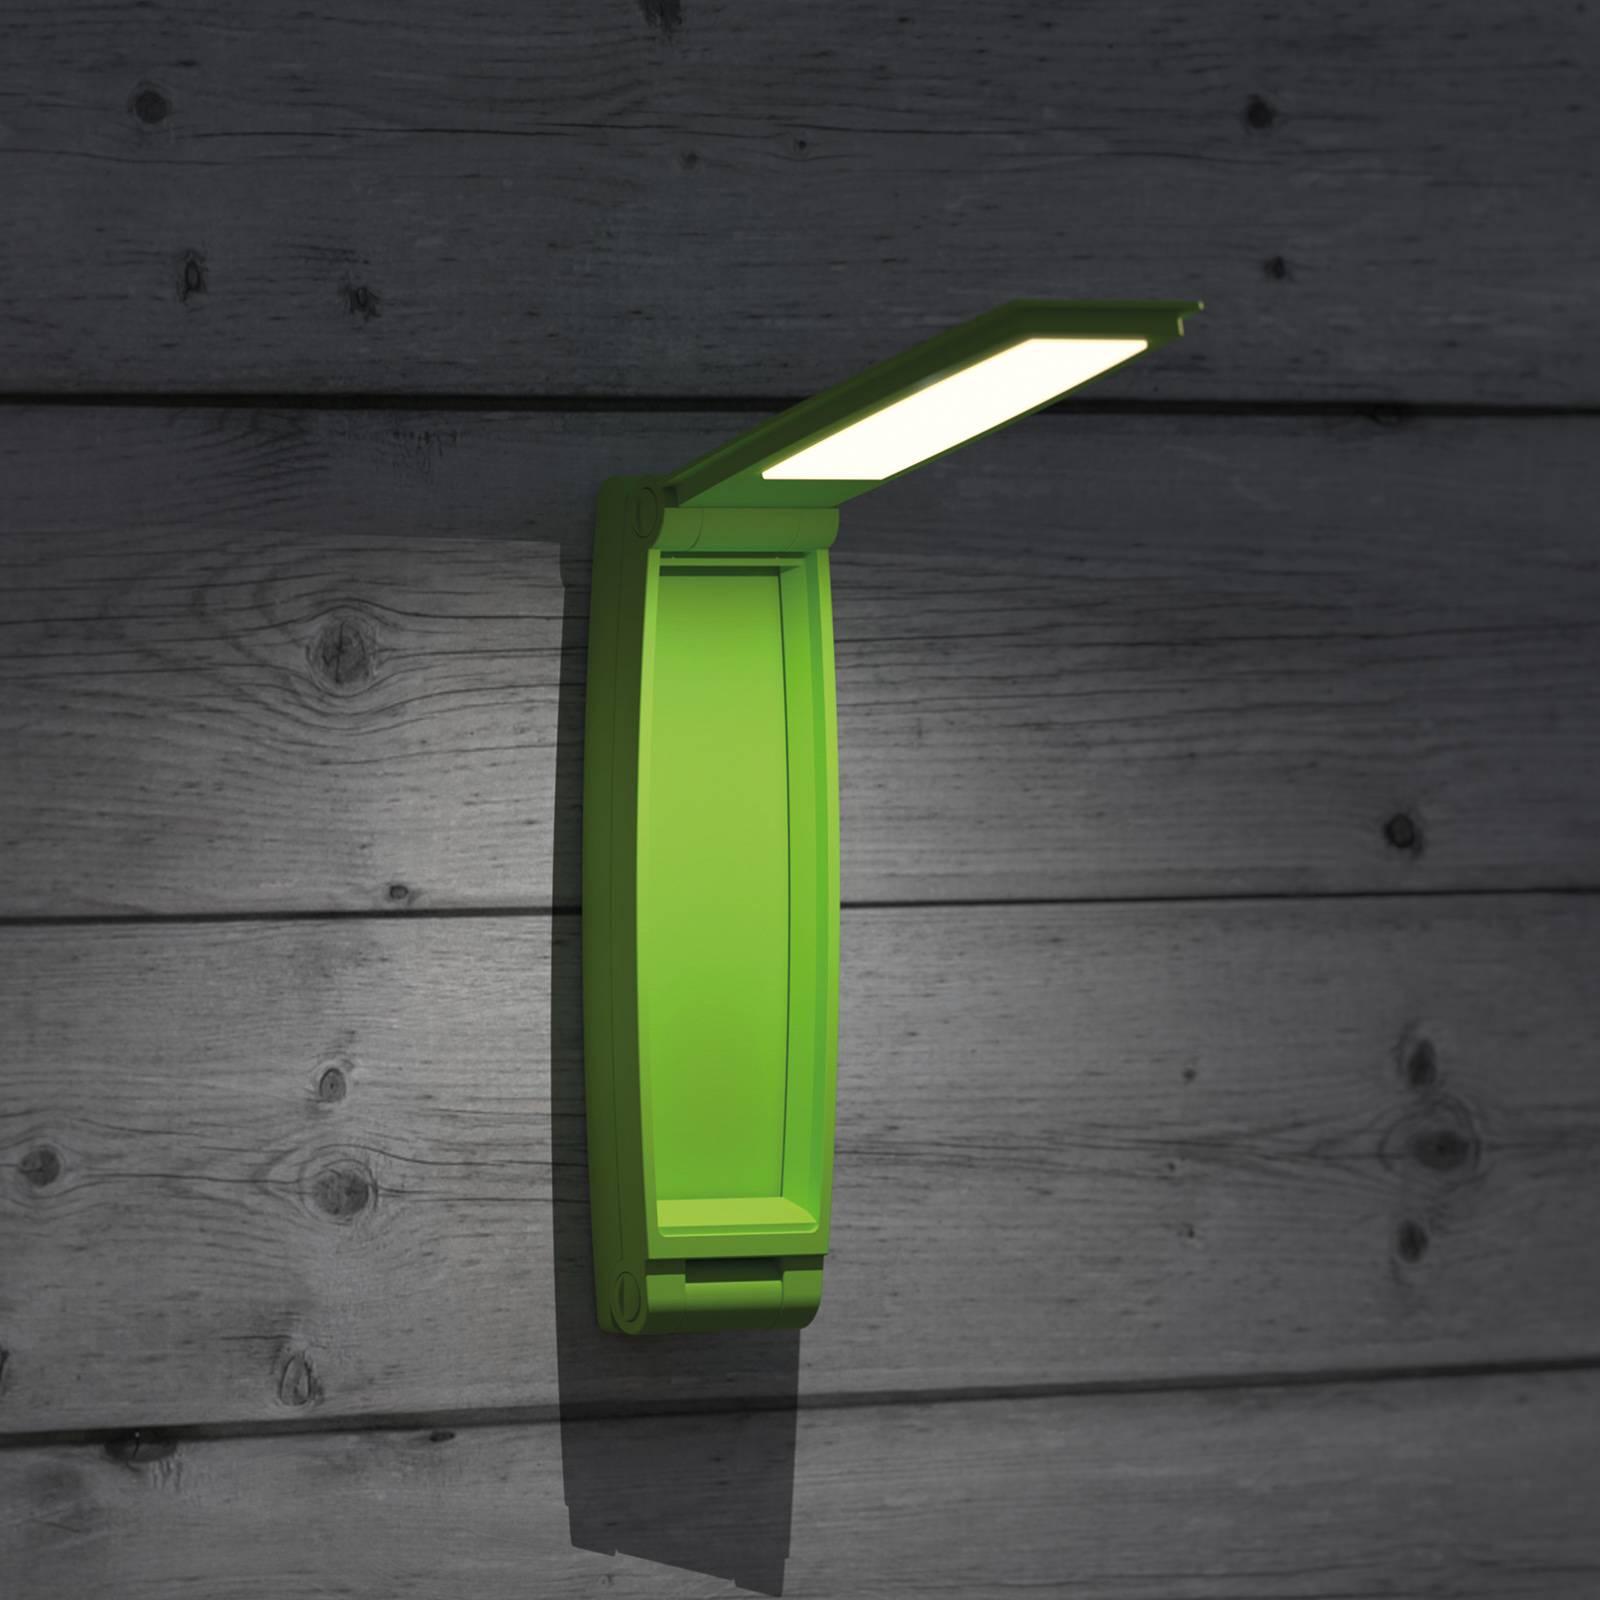 LED-pöytälamppu MAULzed, himmennys, akku, vihreä